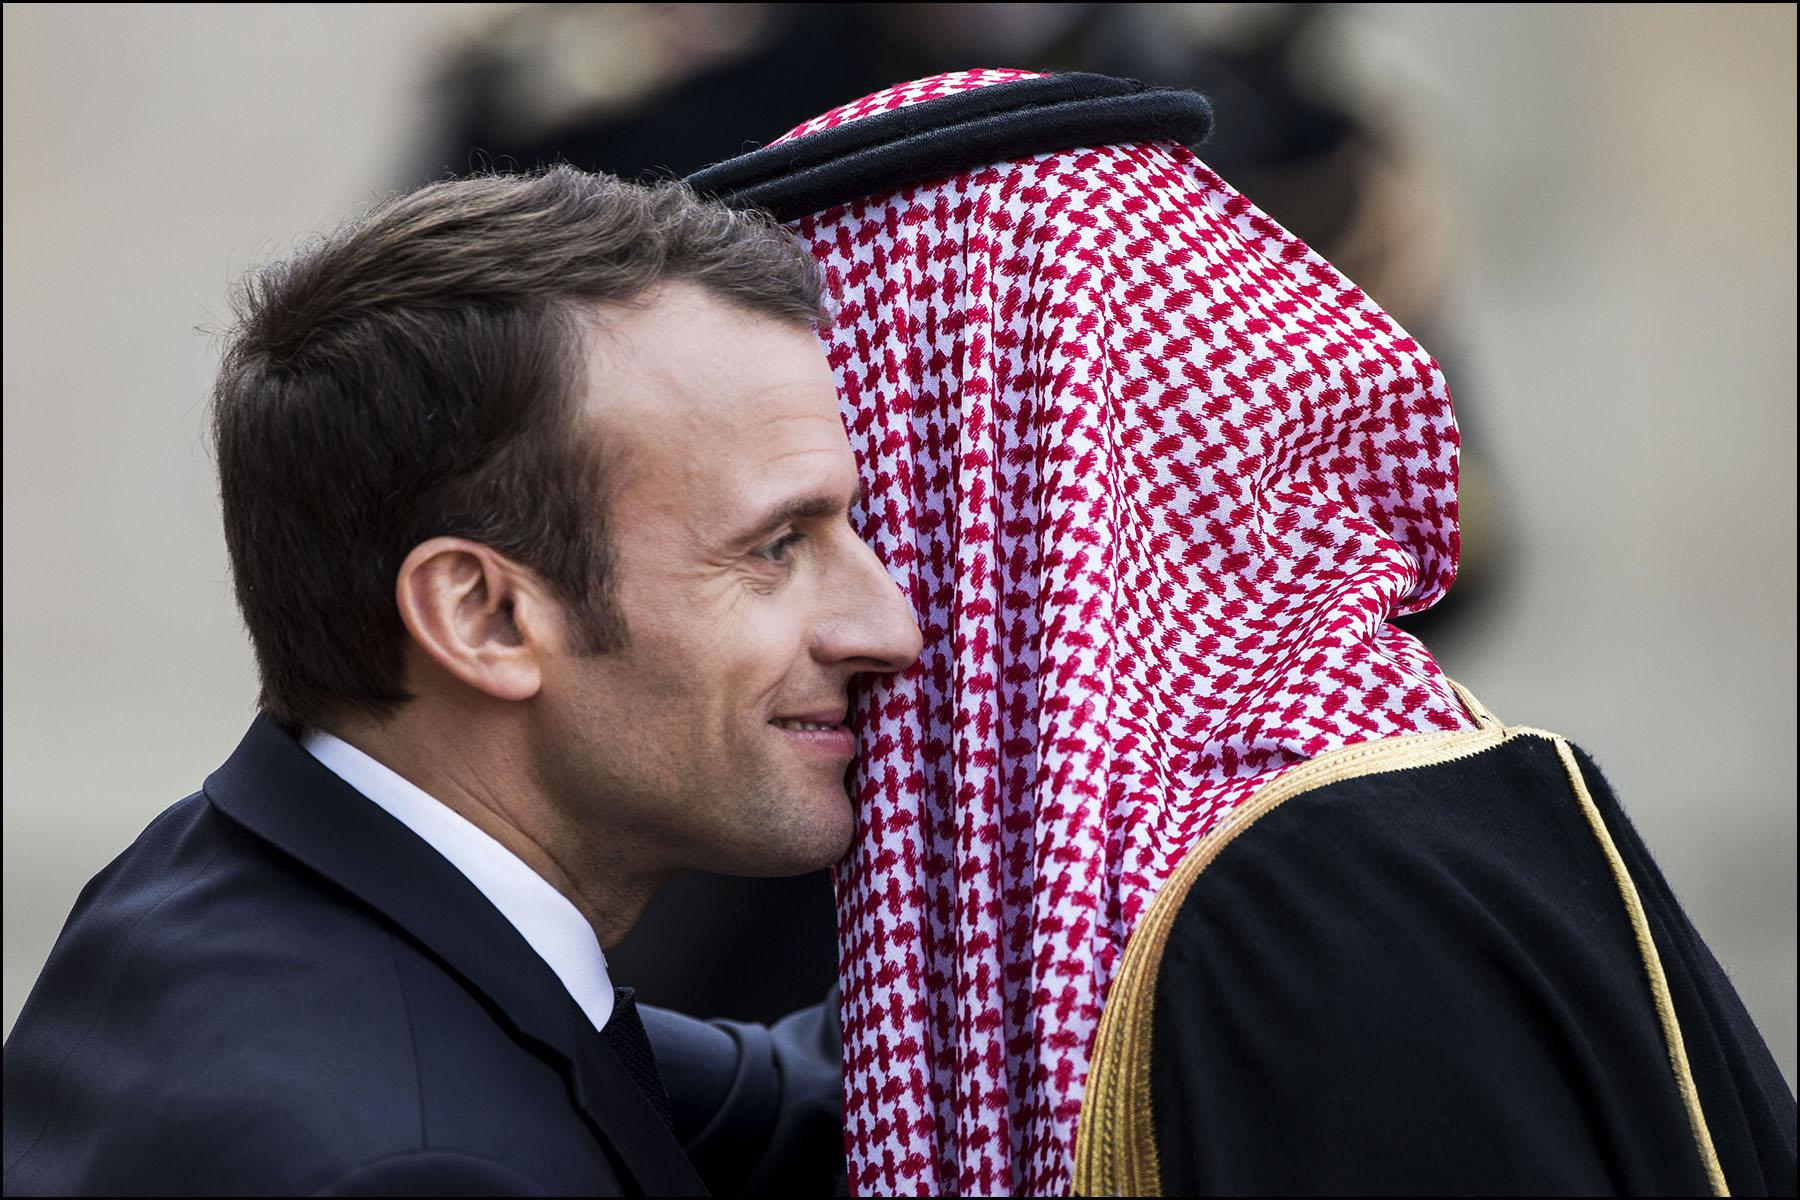 Emmanuel MACRON reçoit Mohammed Bin SALMAN, prince héritier d'Arabie Saoudite.